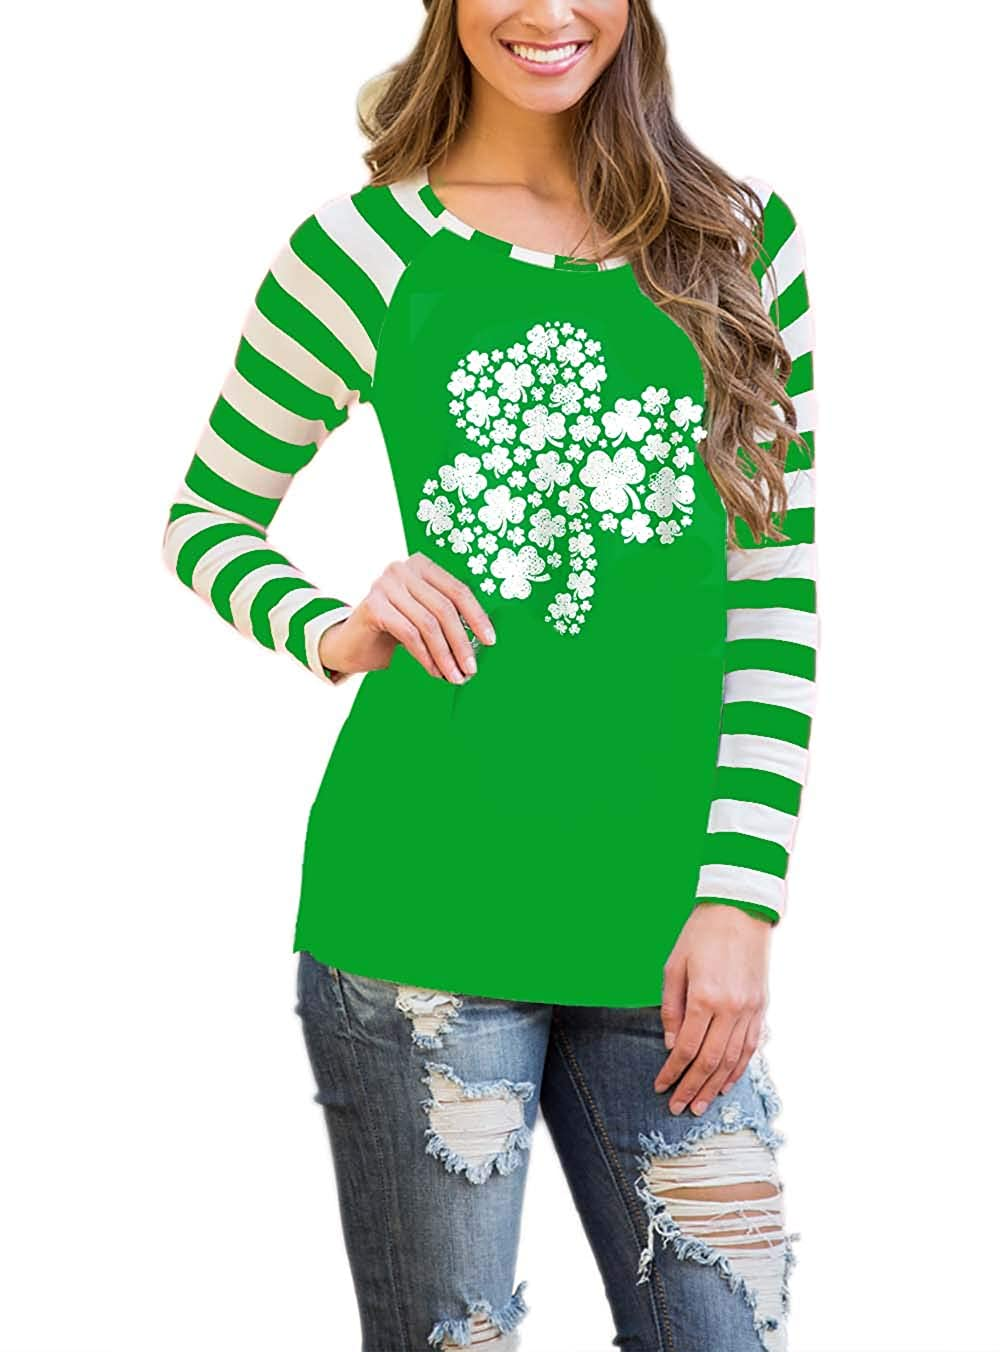 f64e18cfcf5 Amazon.com  DREAGAL Women Long Sleeves Santa Claus Printed Christmas T  Shirt Tops  Clothing